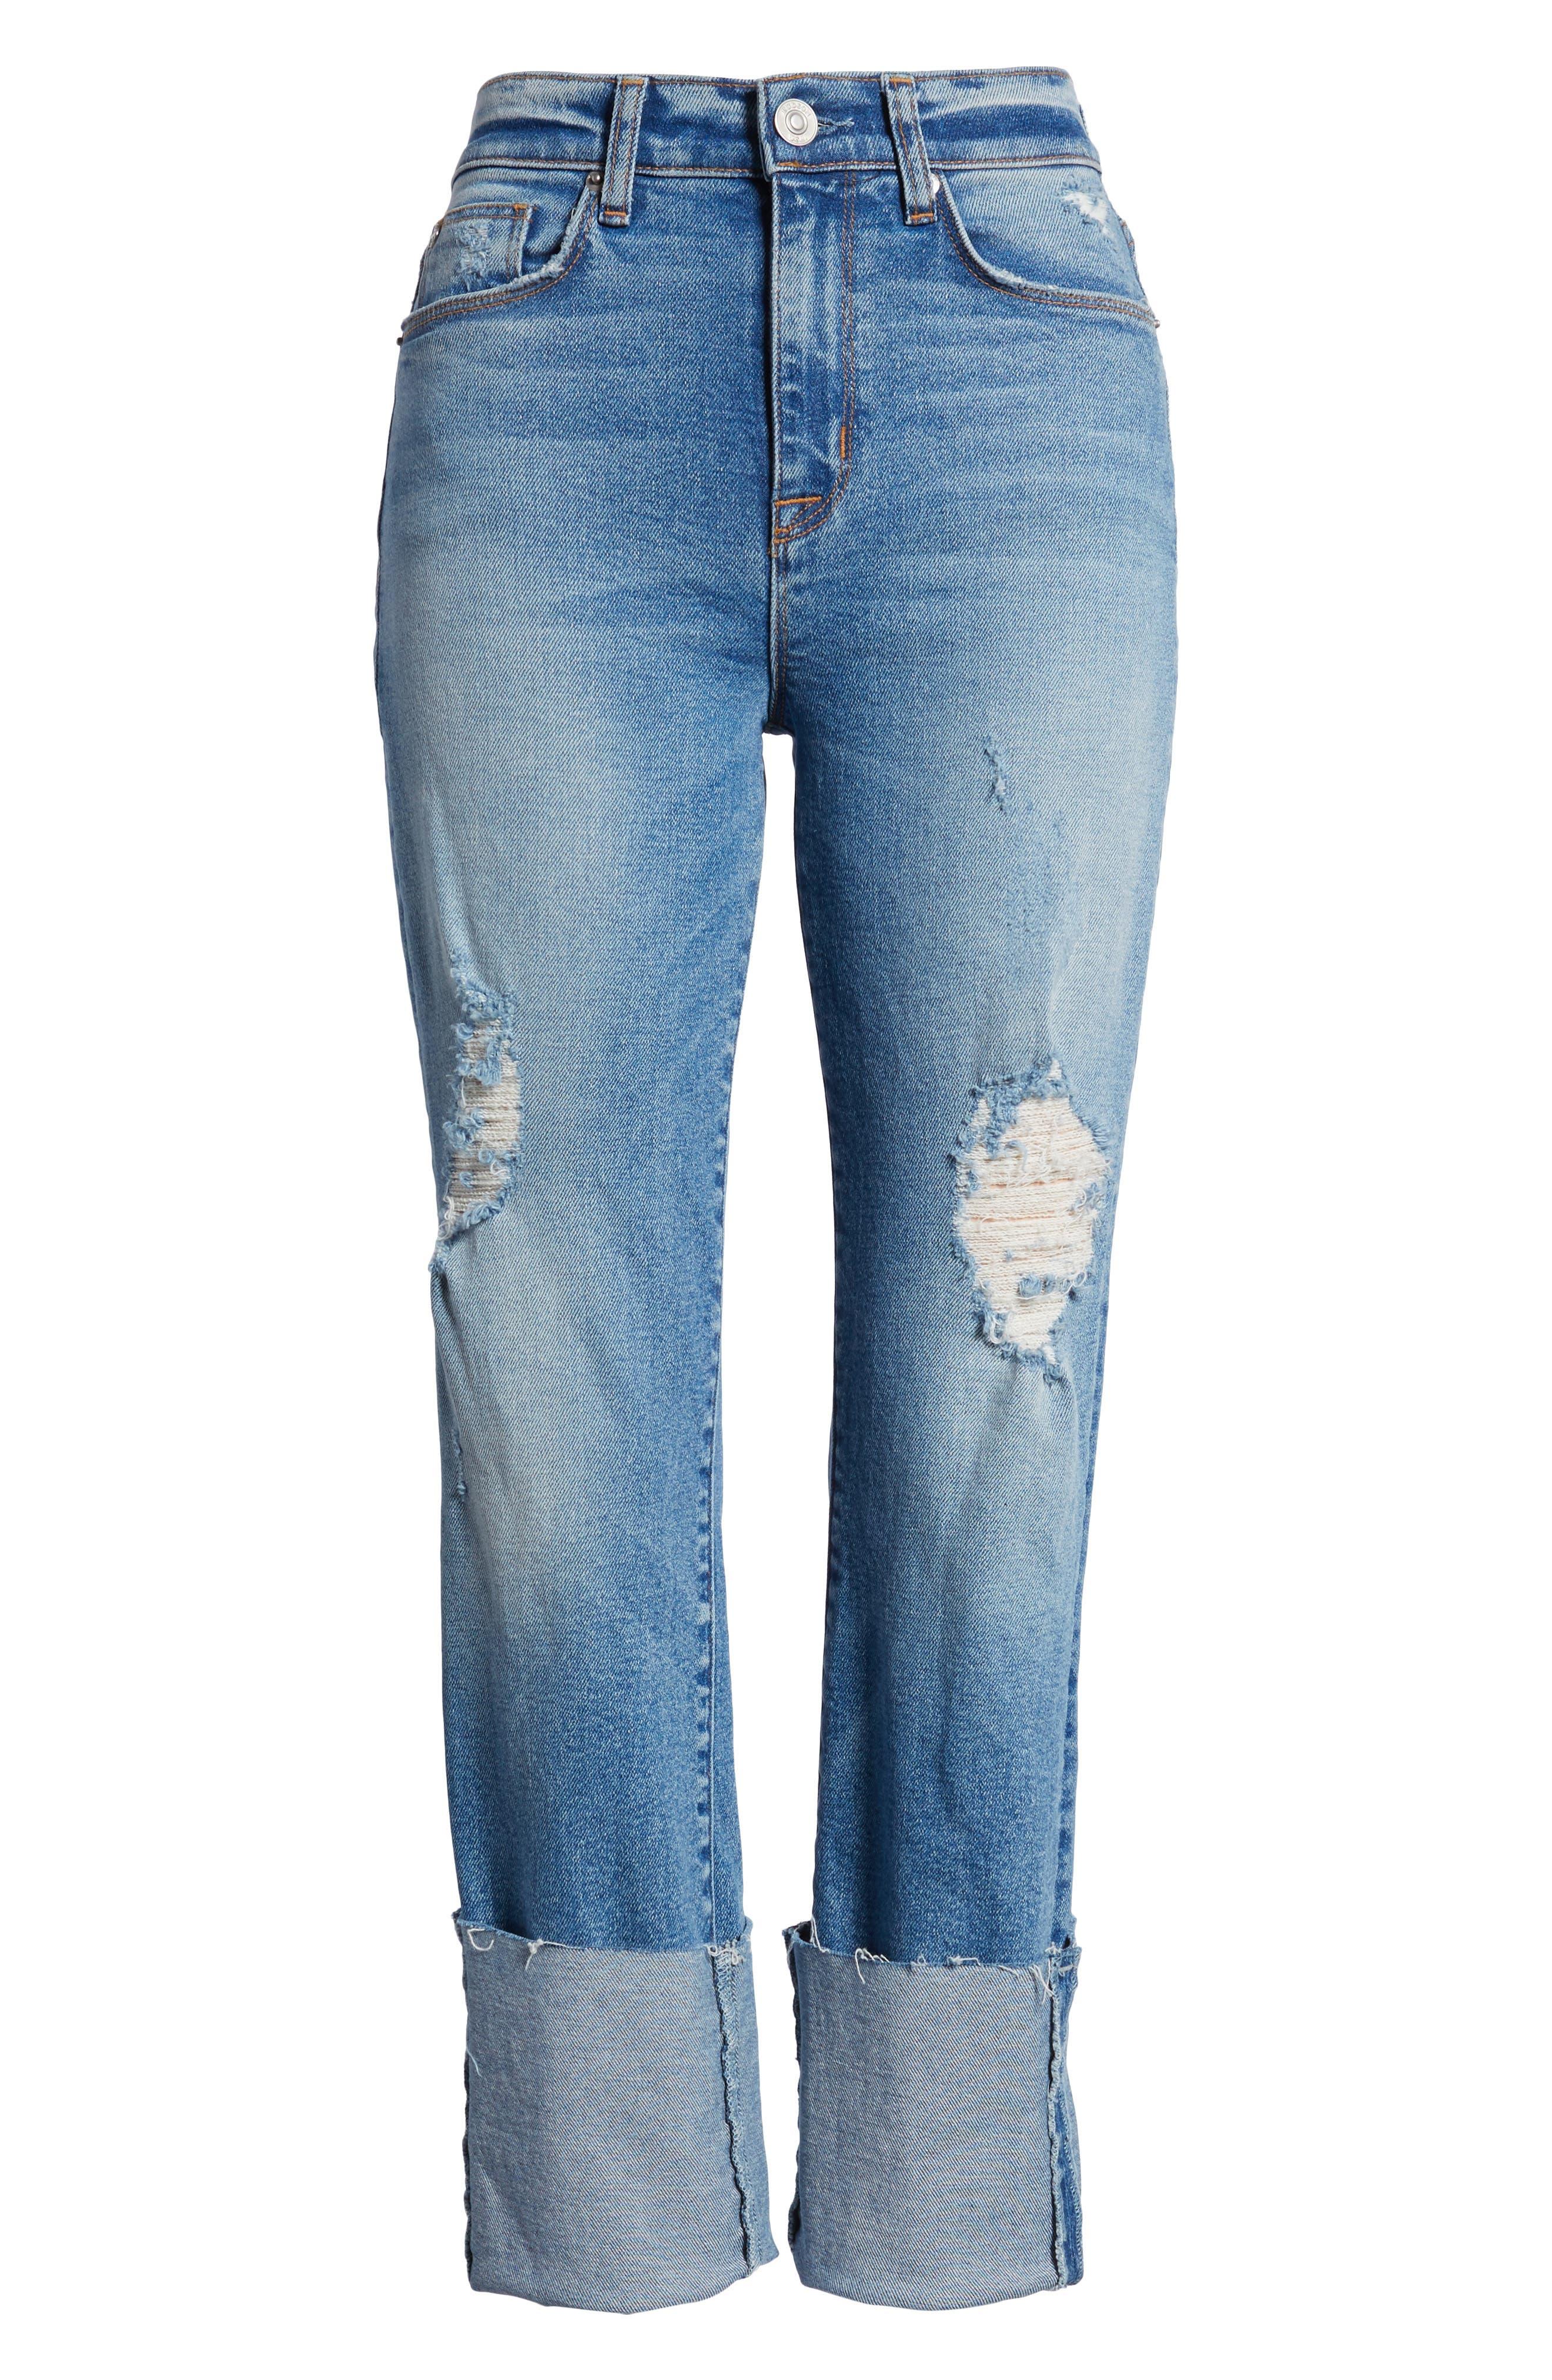 Zoeey High Waist Cuff Straight Leg Jeans,                             Alternate thumbnail 7, color,                             425